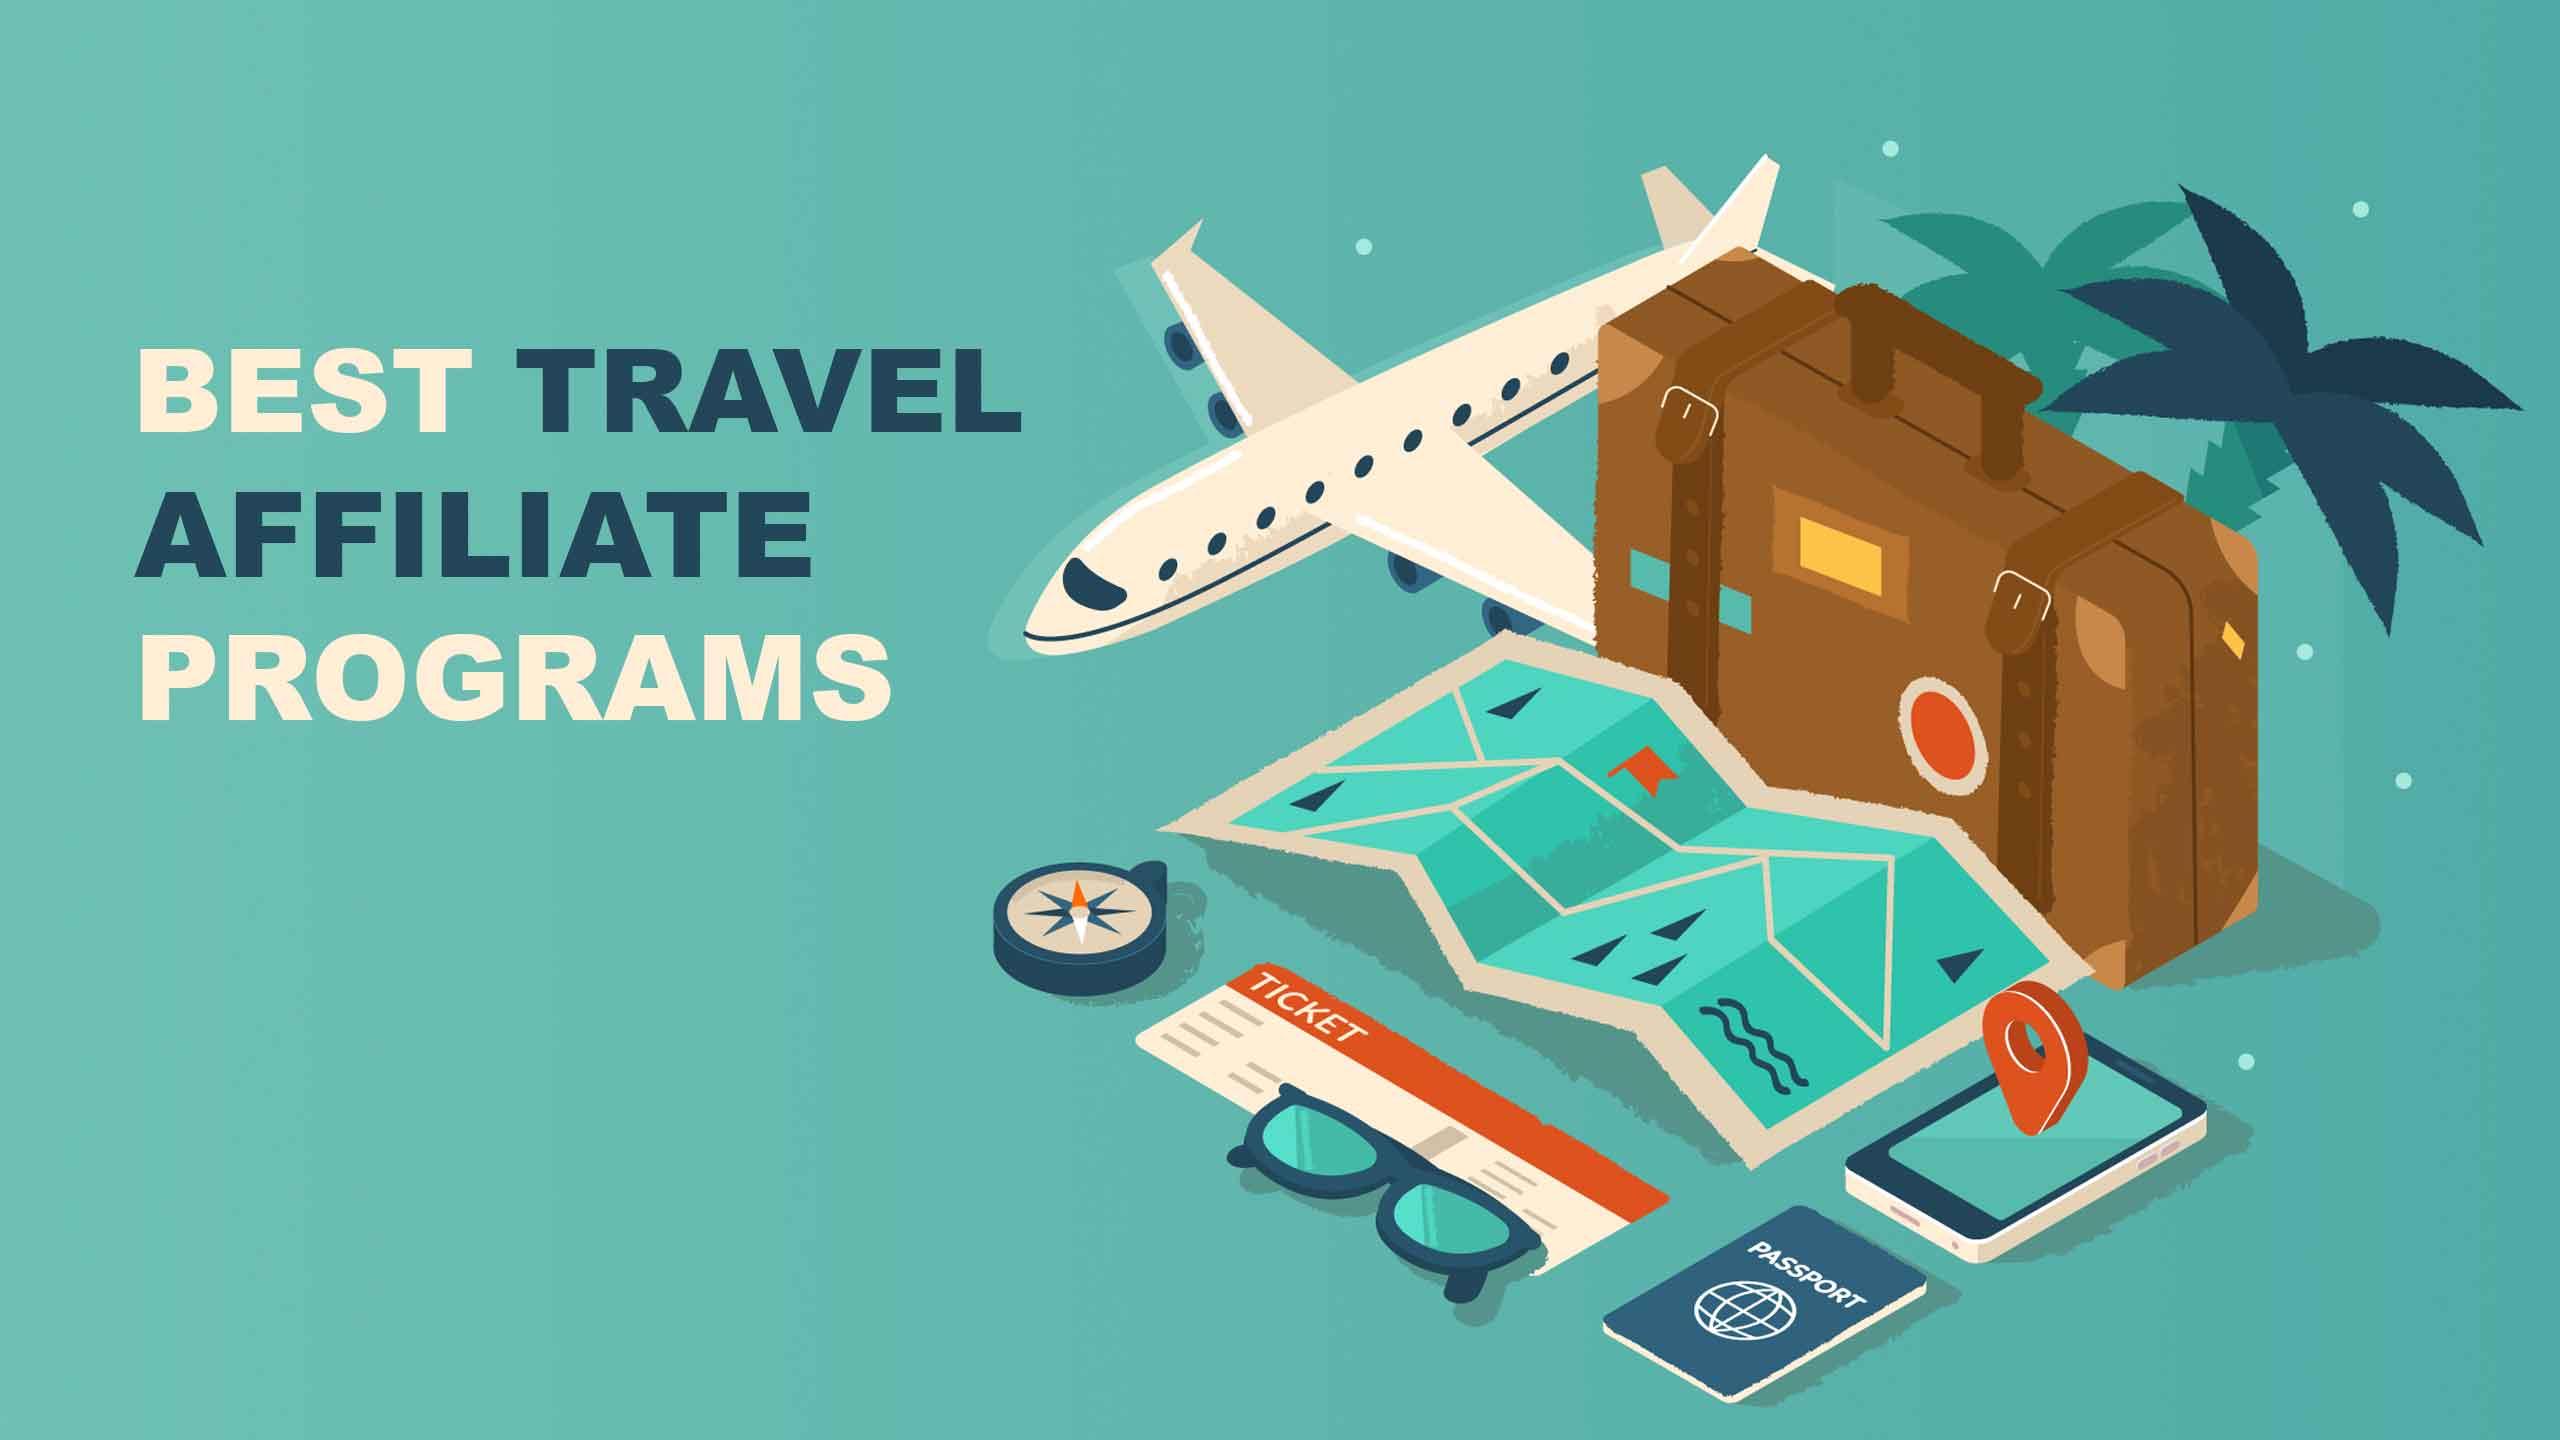 Travel Affiliate Program